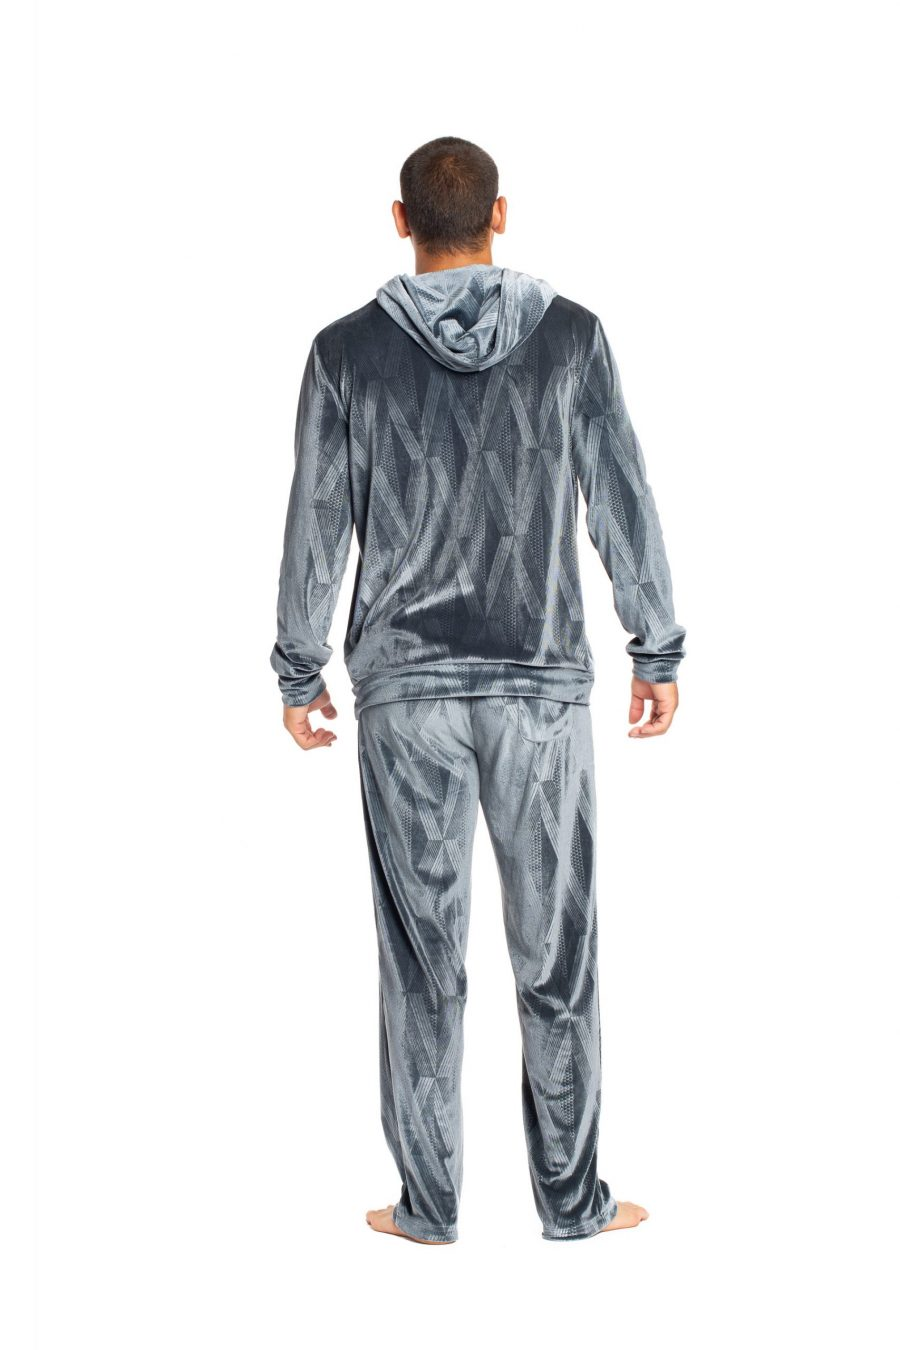 Male Model wearing Kahakai Beach Pant in Sharkskin Grey Kanaloa Pattern - Back View